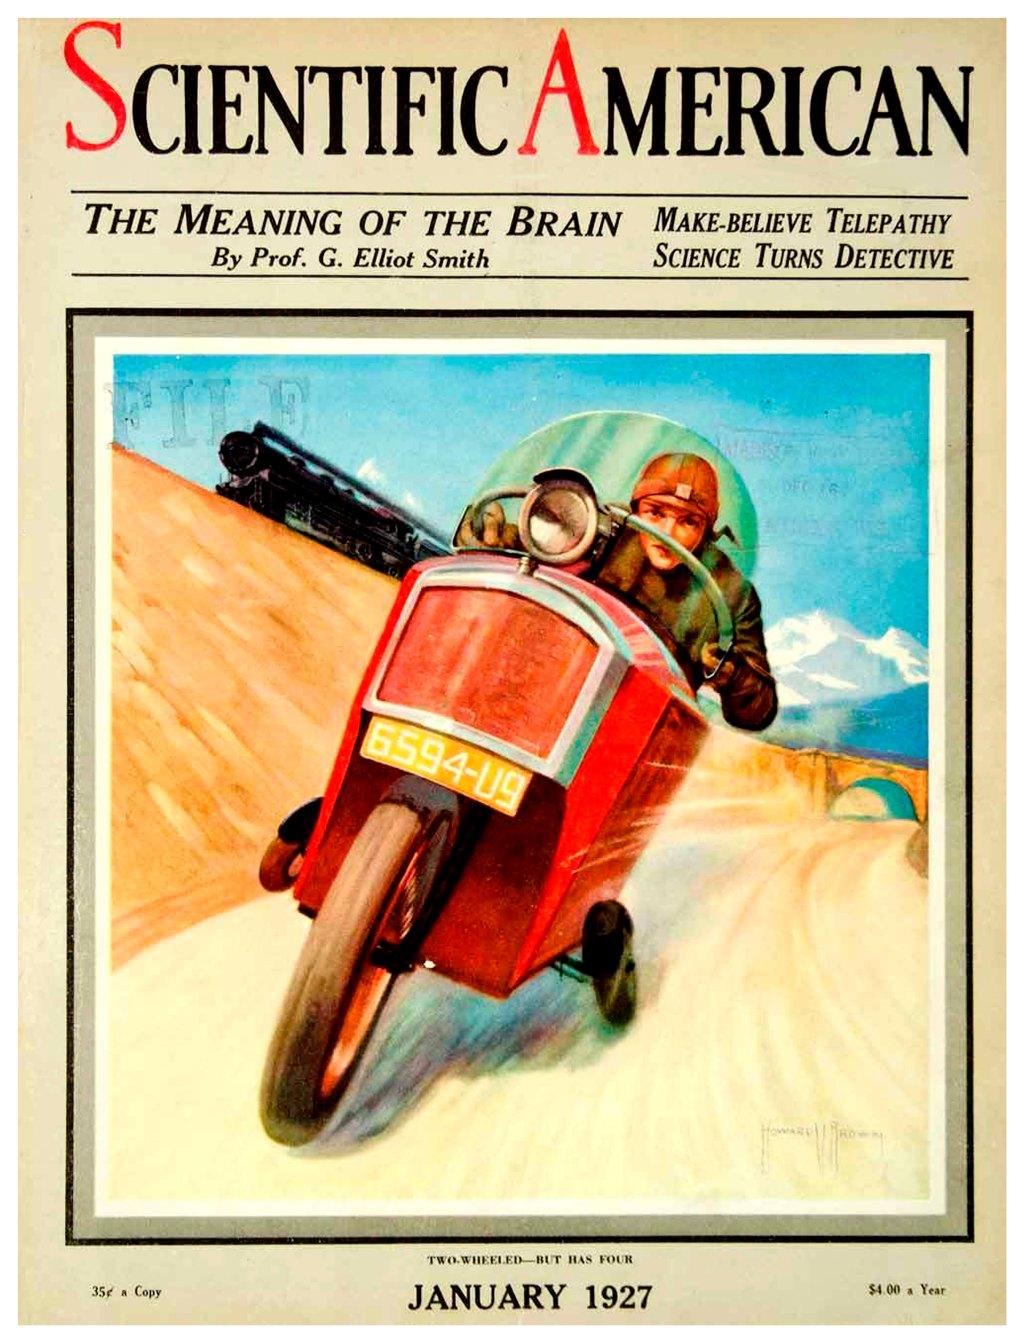 Scientific American - January 1927 - Howard V. Brown